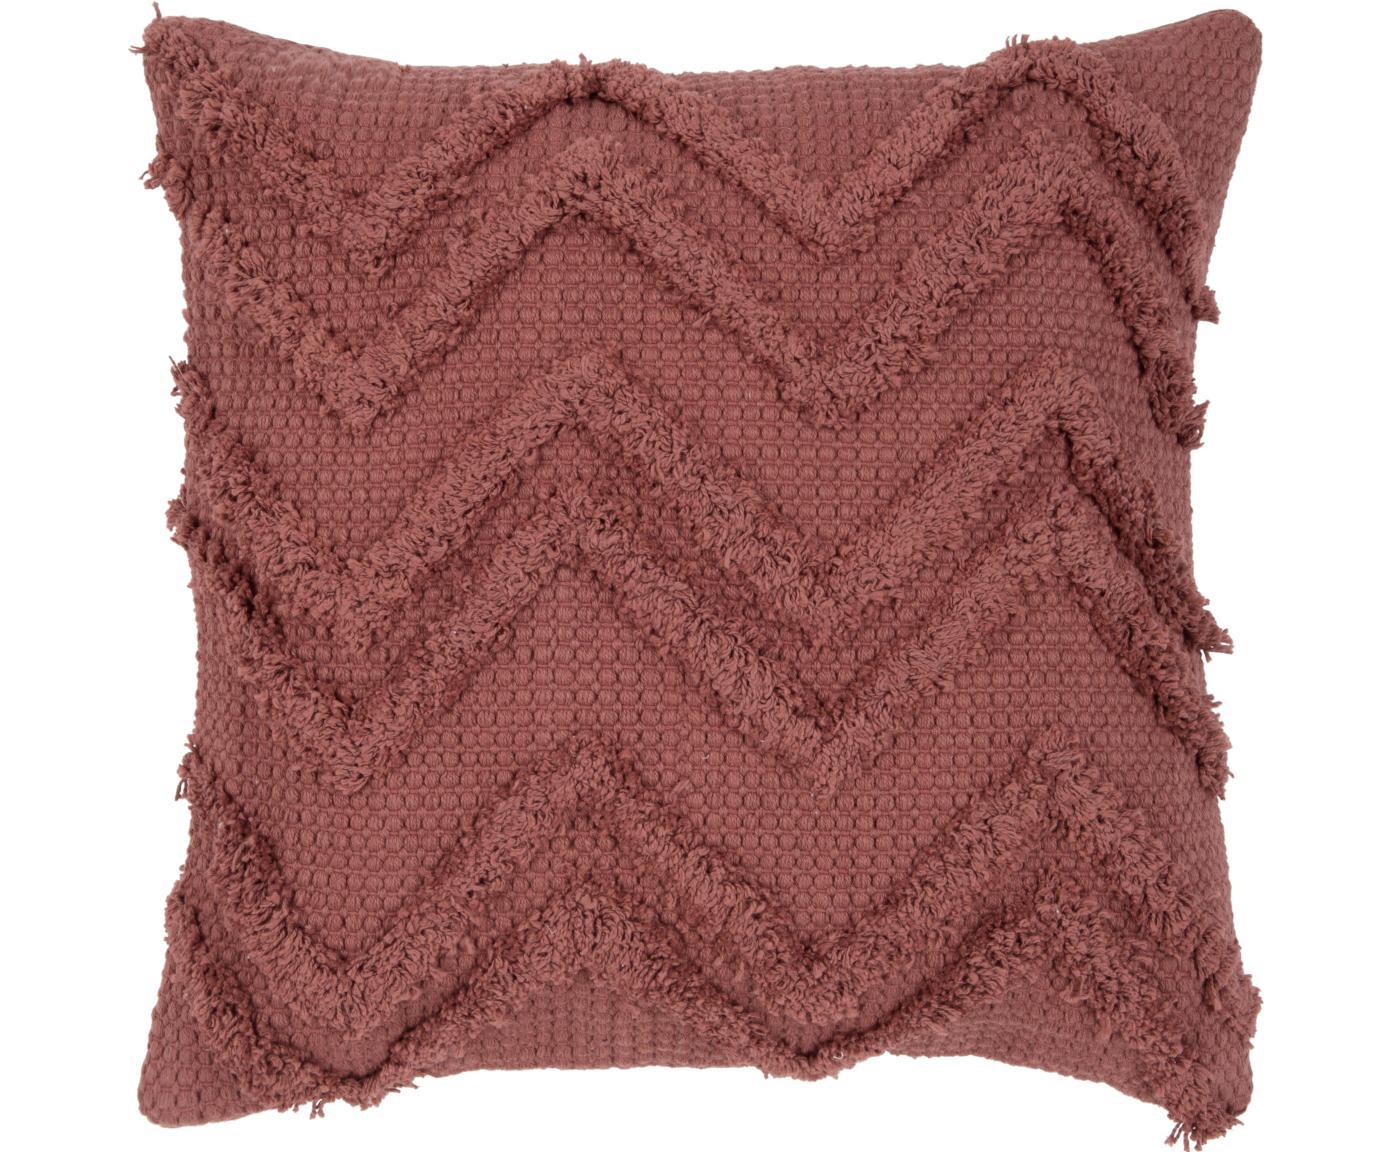 Kissenhülle Akesha mit Zickzack-Muster, 100% Baumwolle, Rostrot, 45 x 45 cm